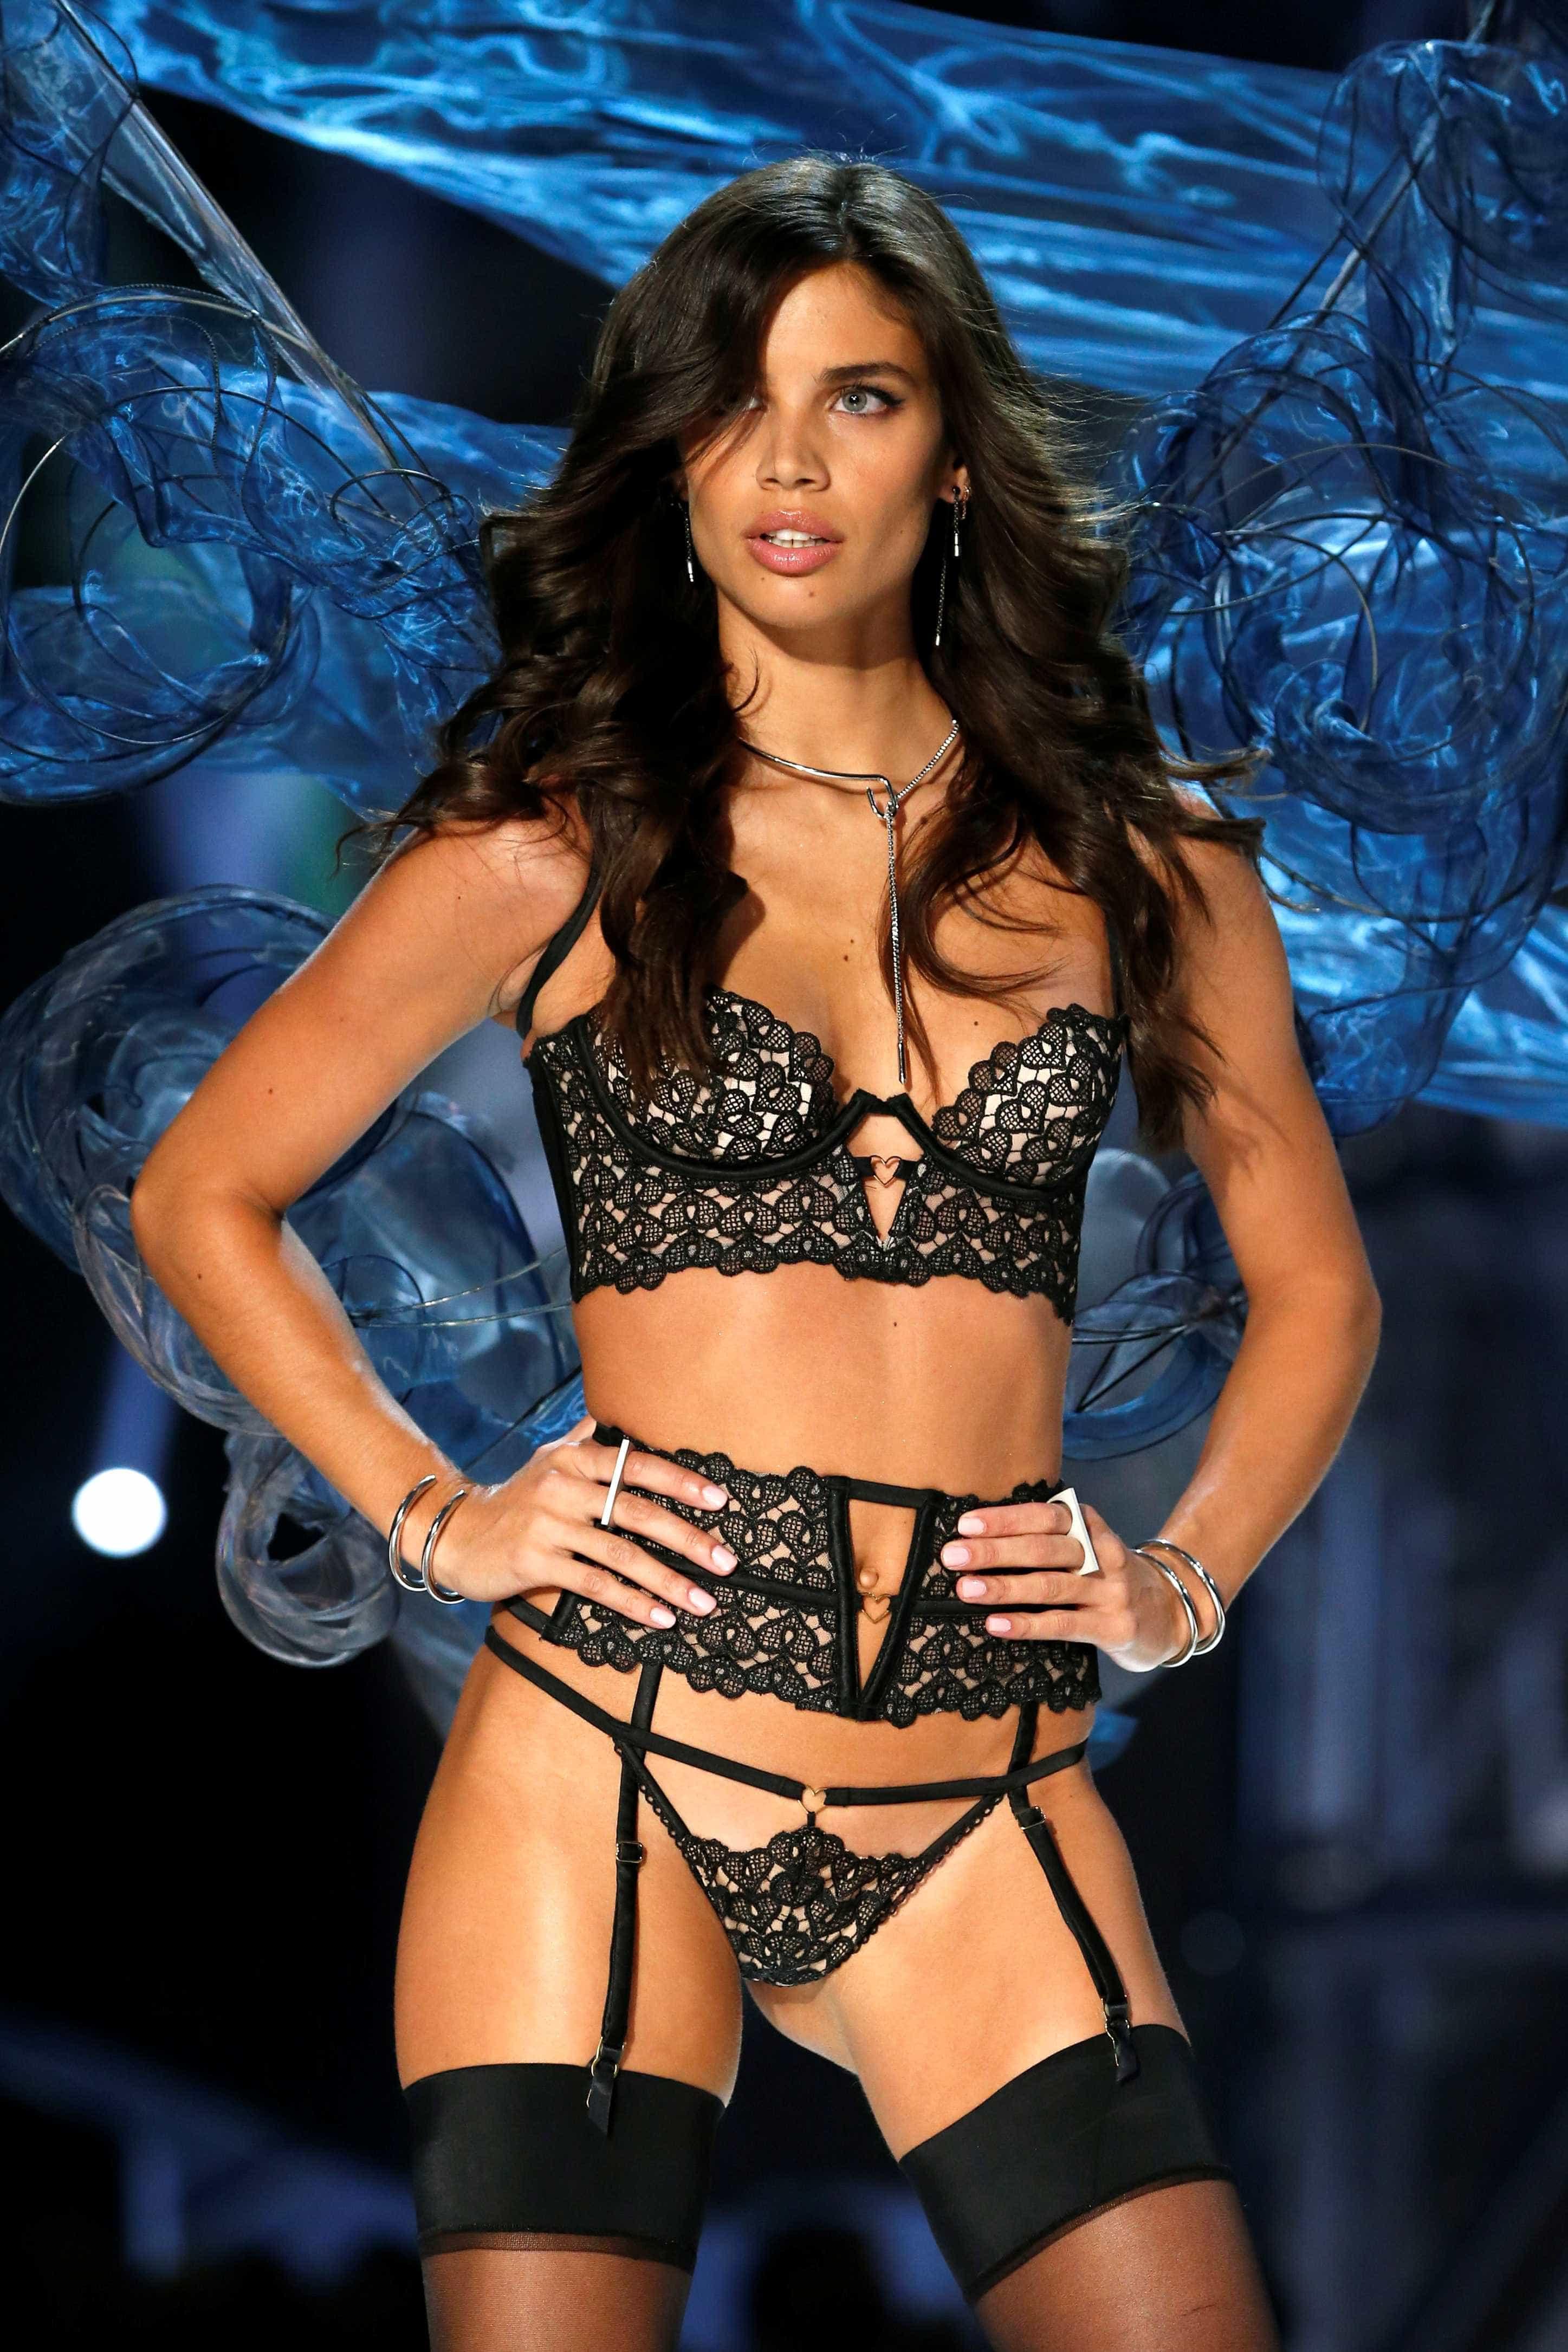 Sara Sampaio leiloa bilhetes para o desfile da Victoria's Secret